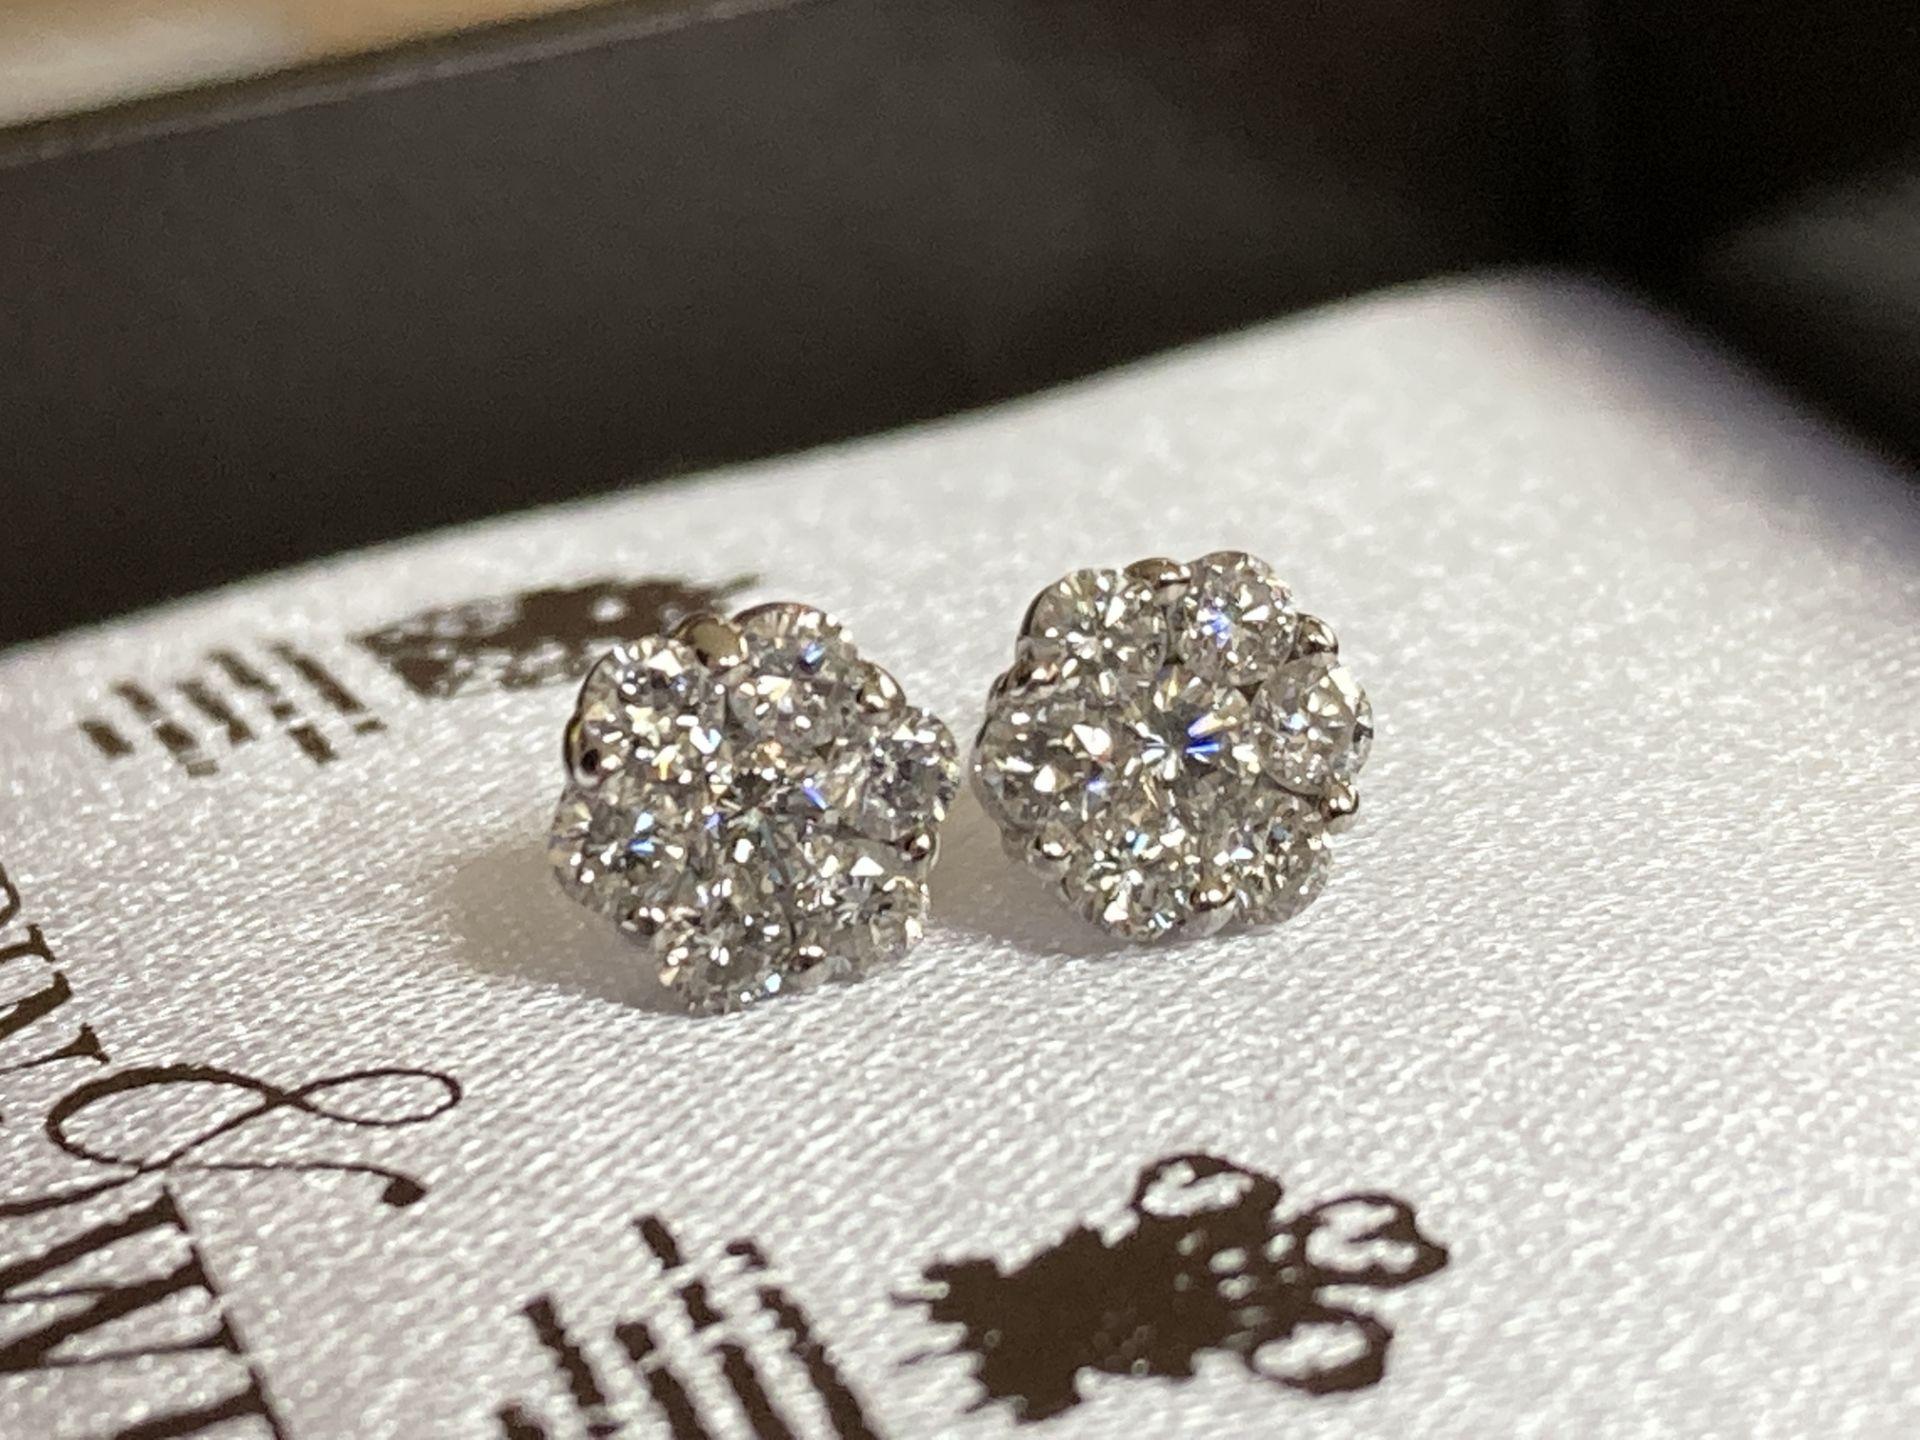 0.7CT DIAMOND 18K EARRINGS - Image 3 of 3